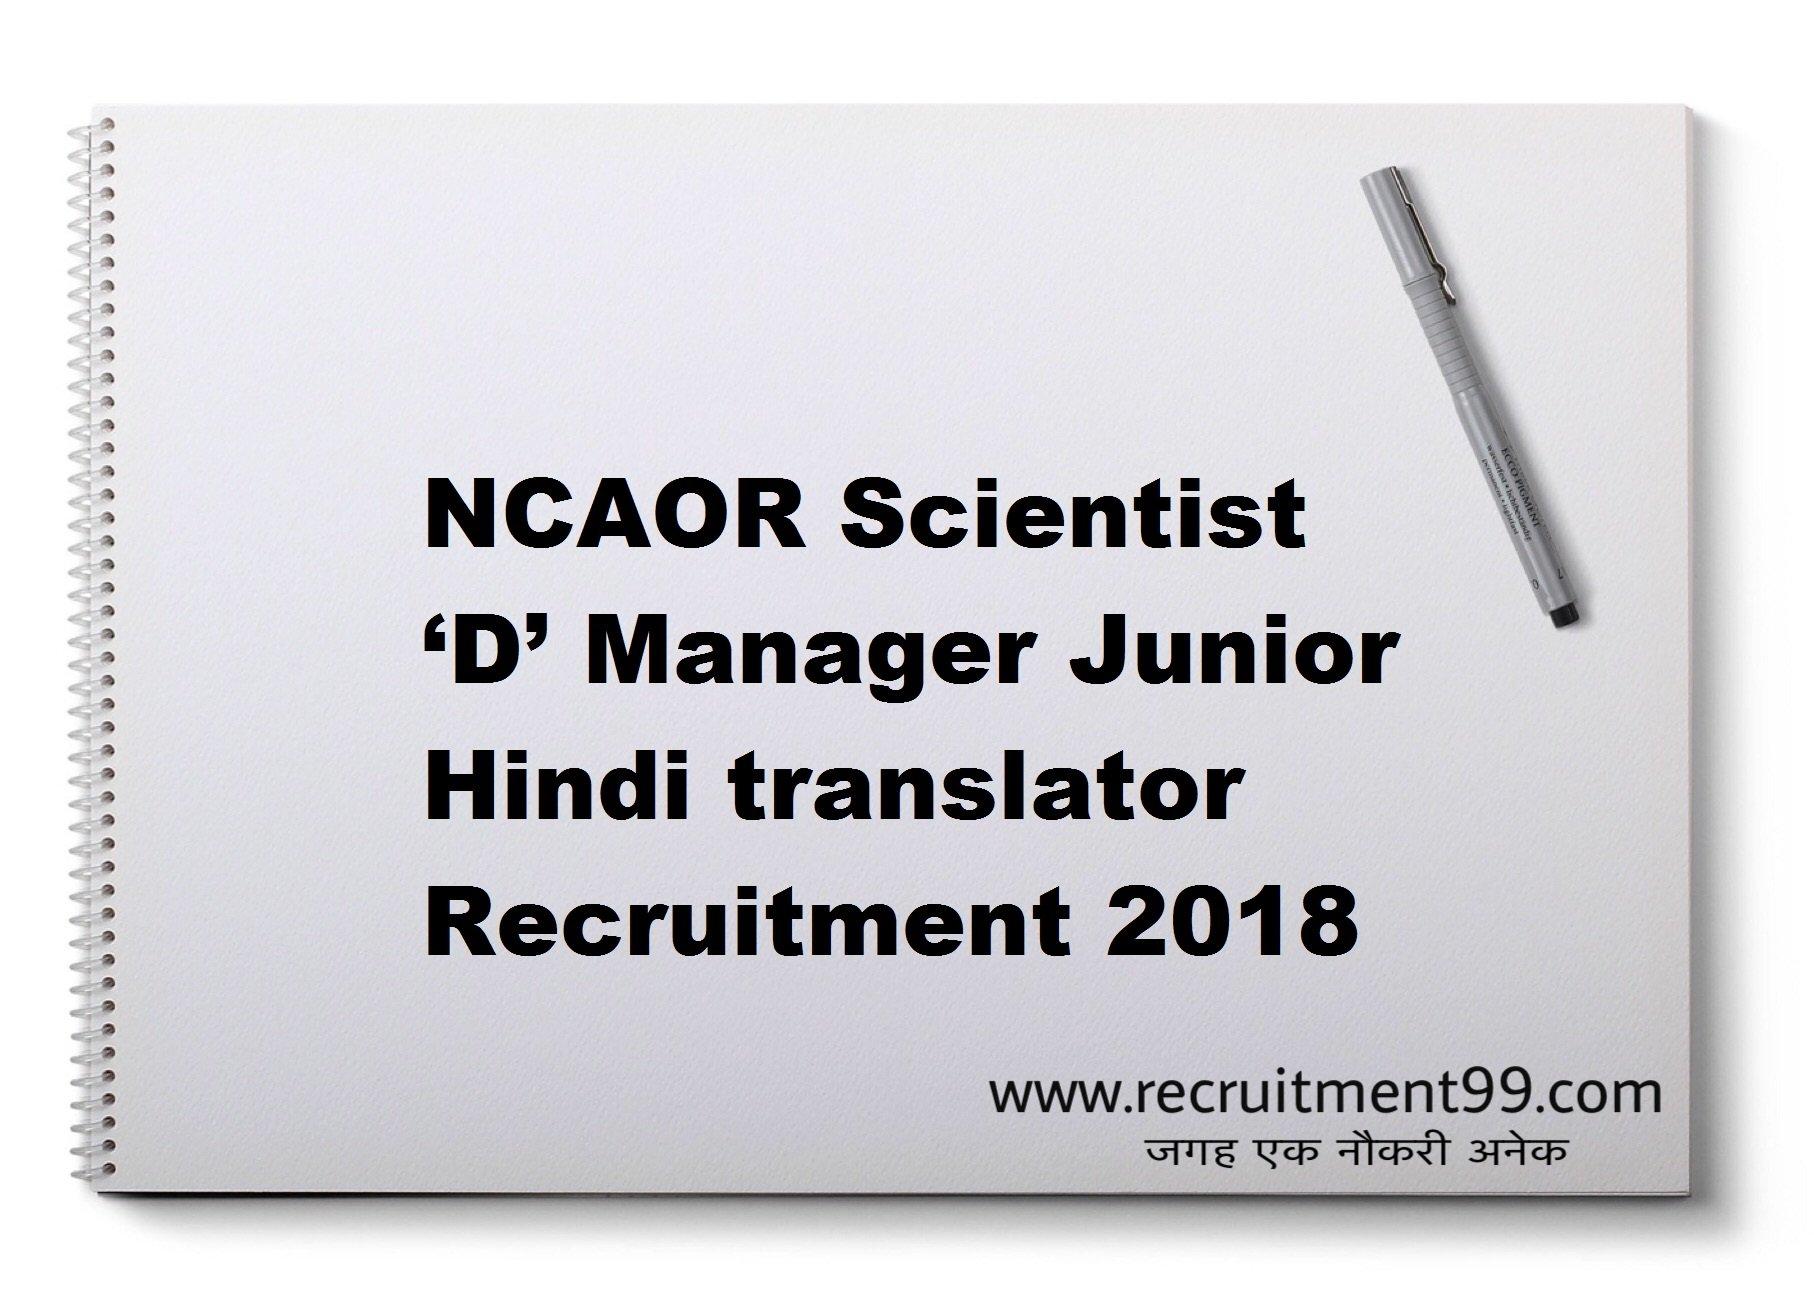 NCAOR Scientist 'D', Manager, Junior Hindi Translator Recruitment Admit Card Result 2018